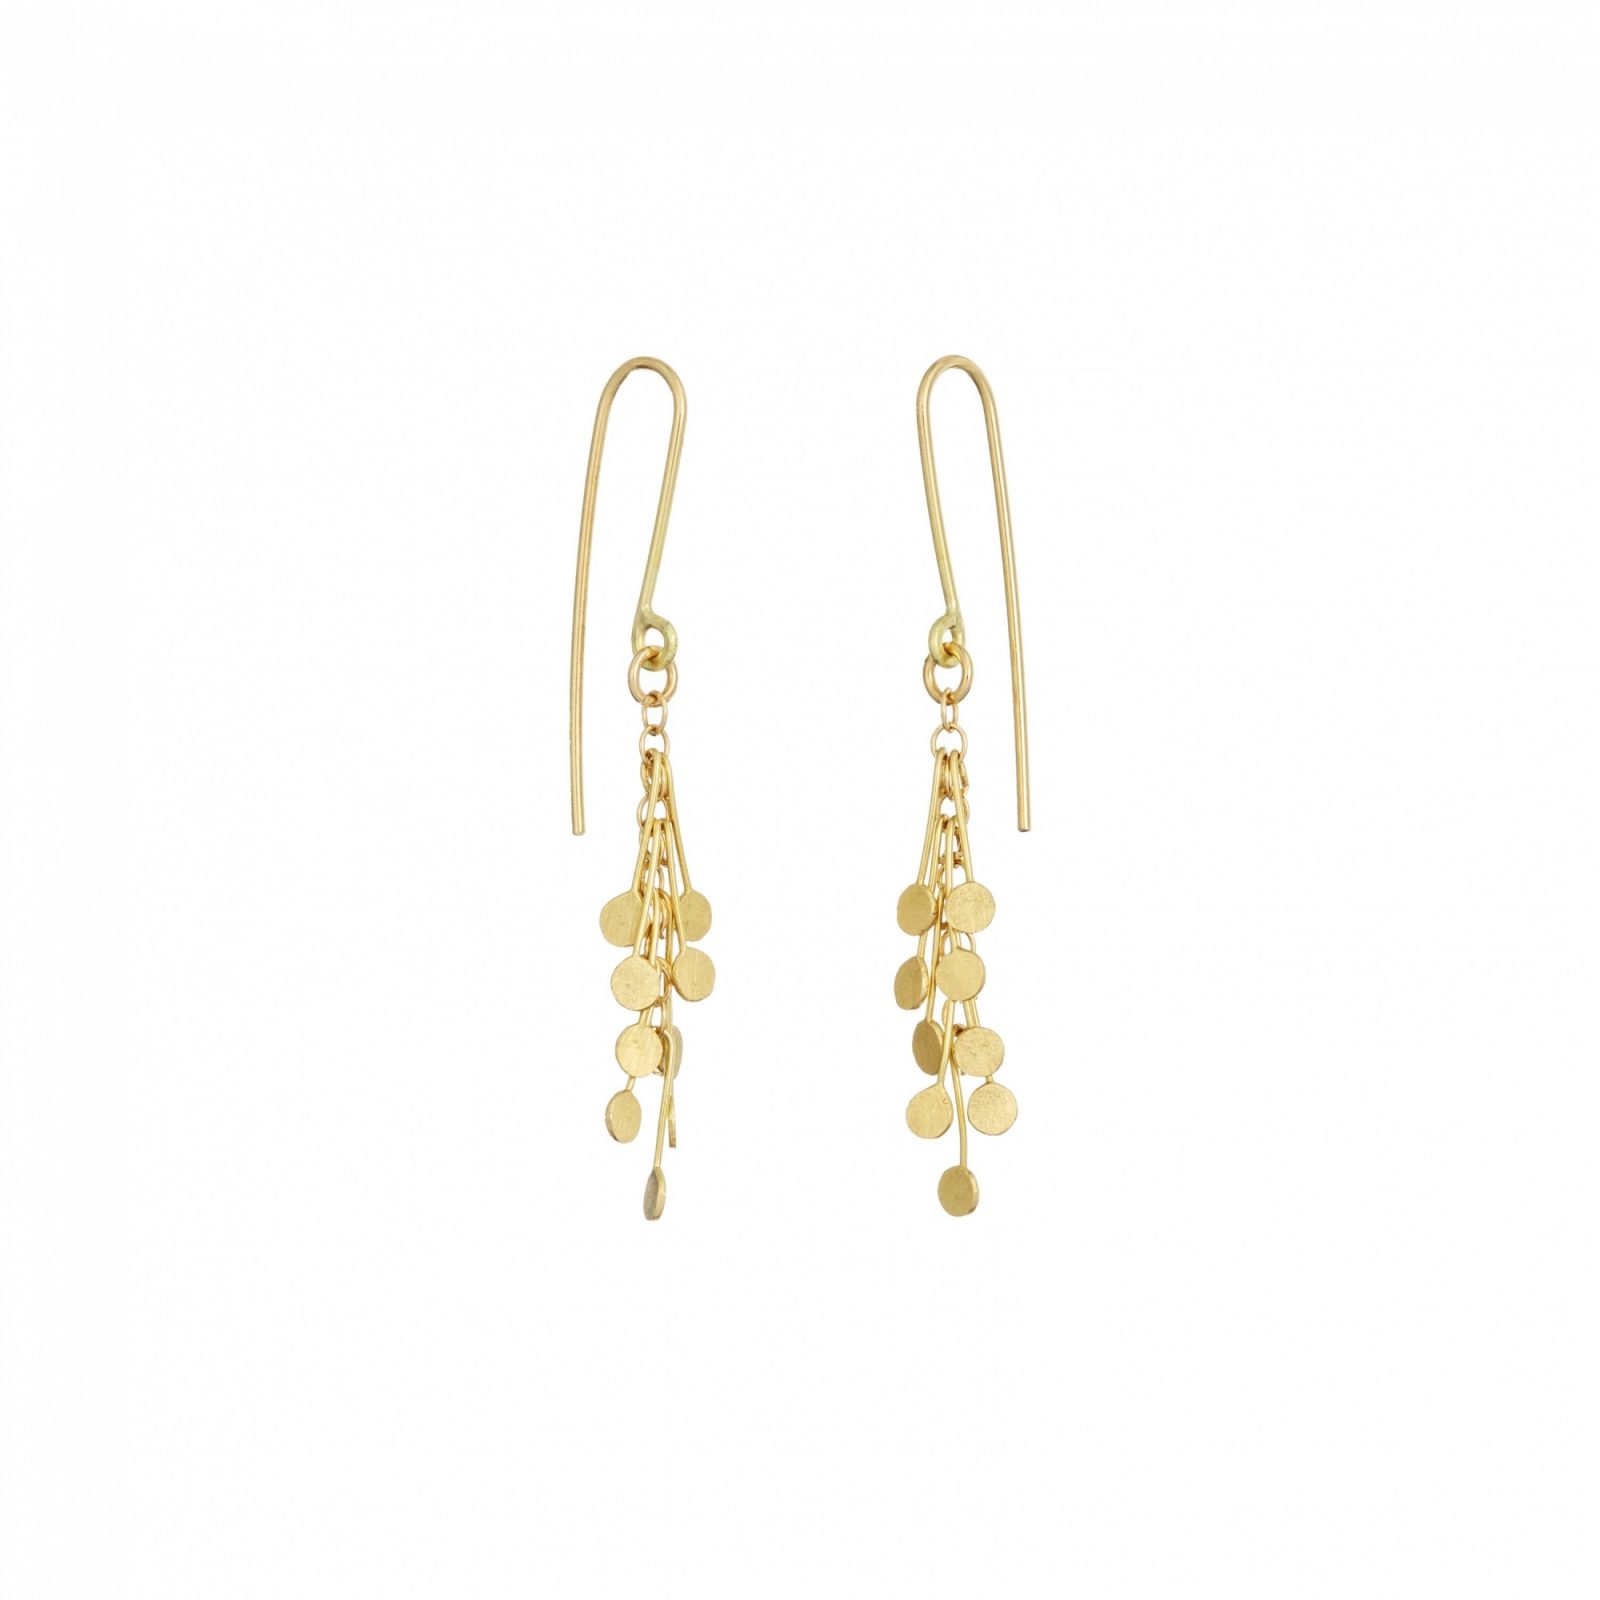 Sia Taylor DE24 Y Yellow Gold Dot Earrings WB